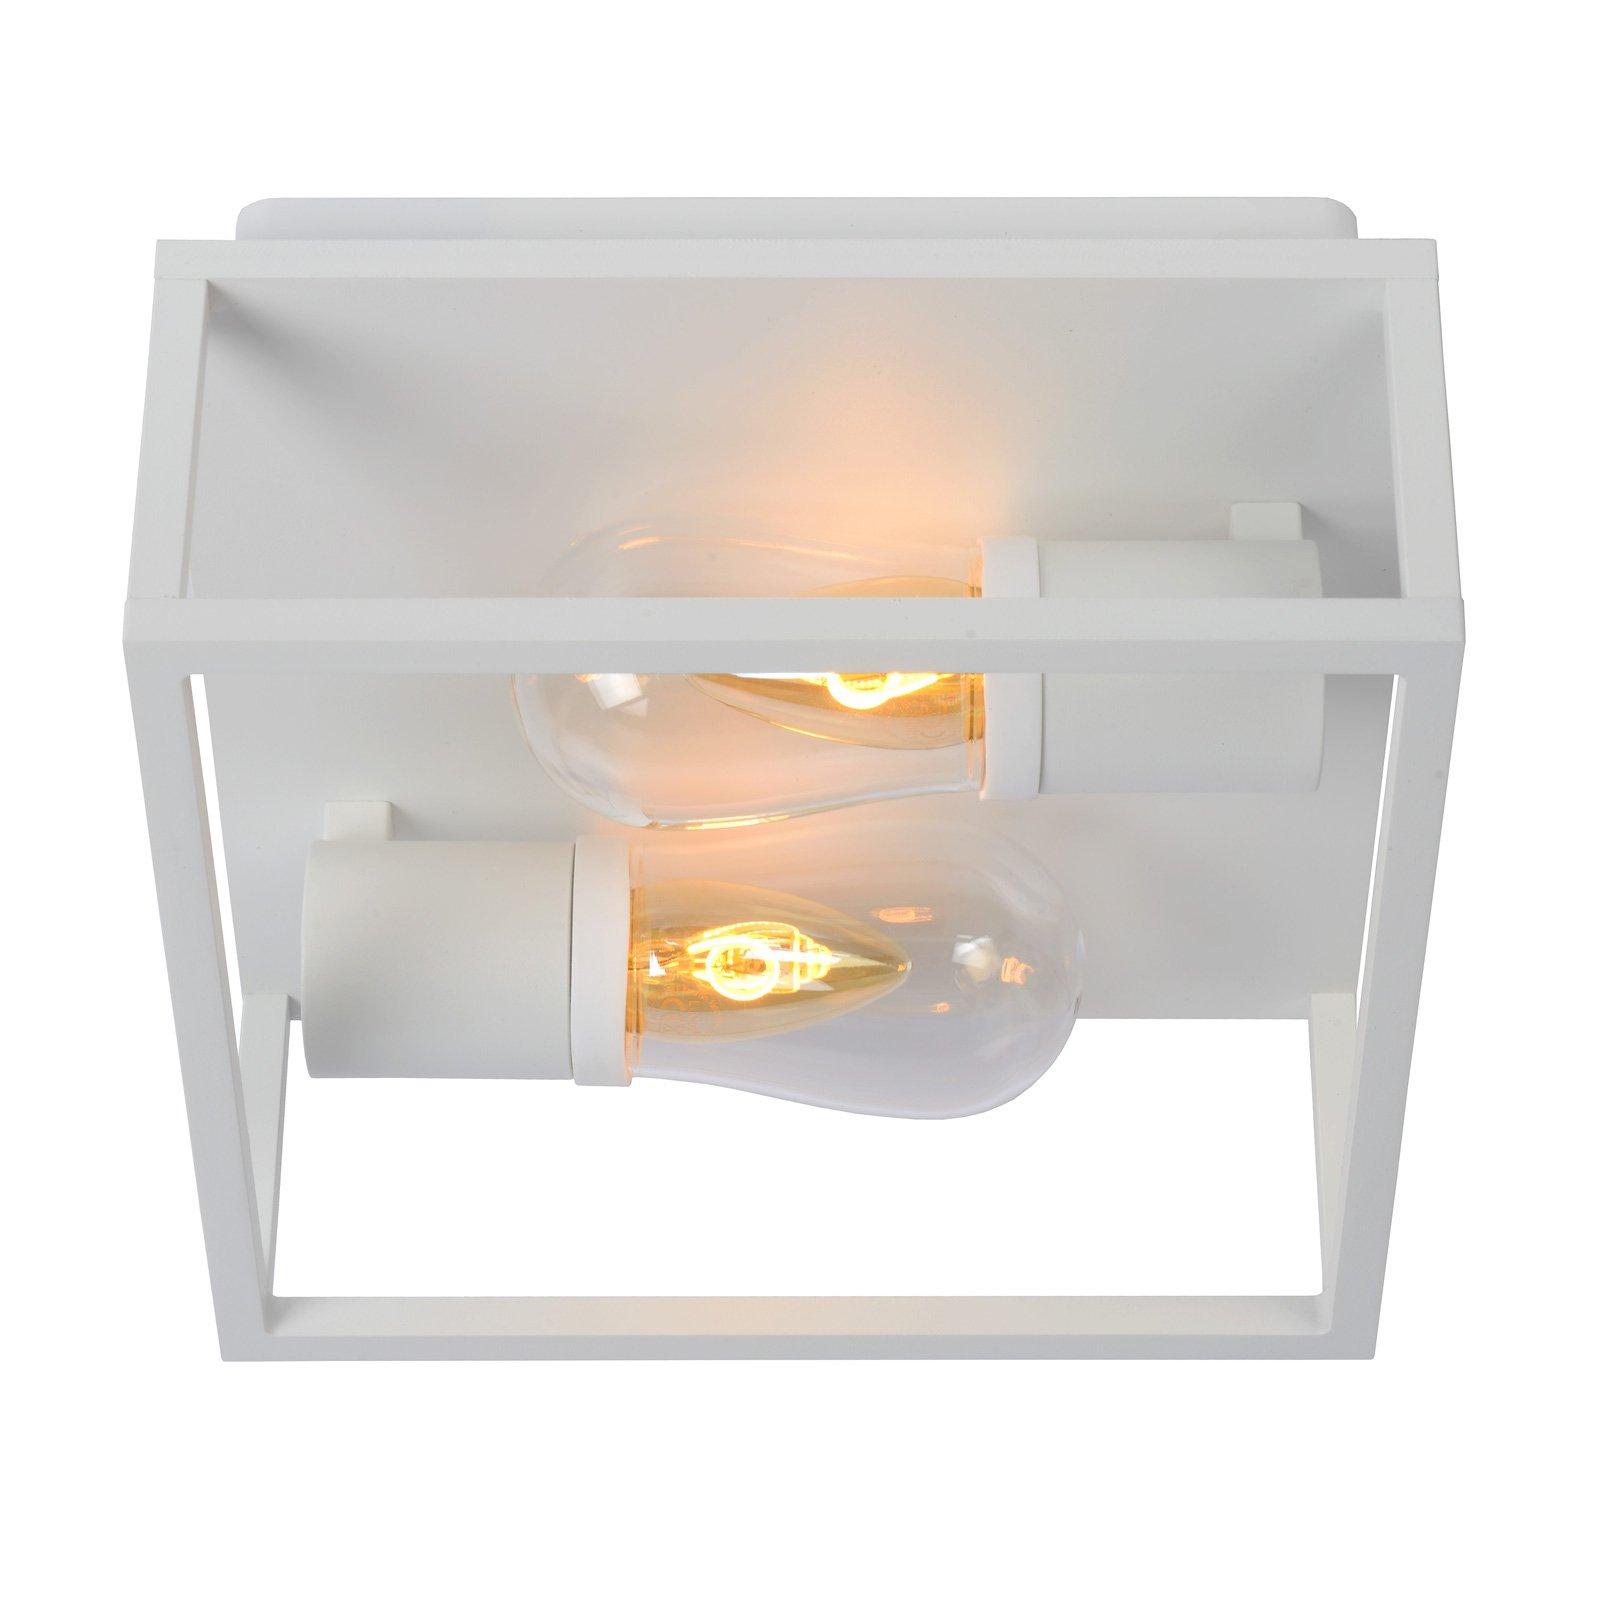 Taklampe Carlyn baderom 2 lyskilder hvit